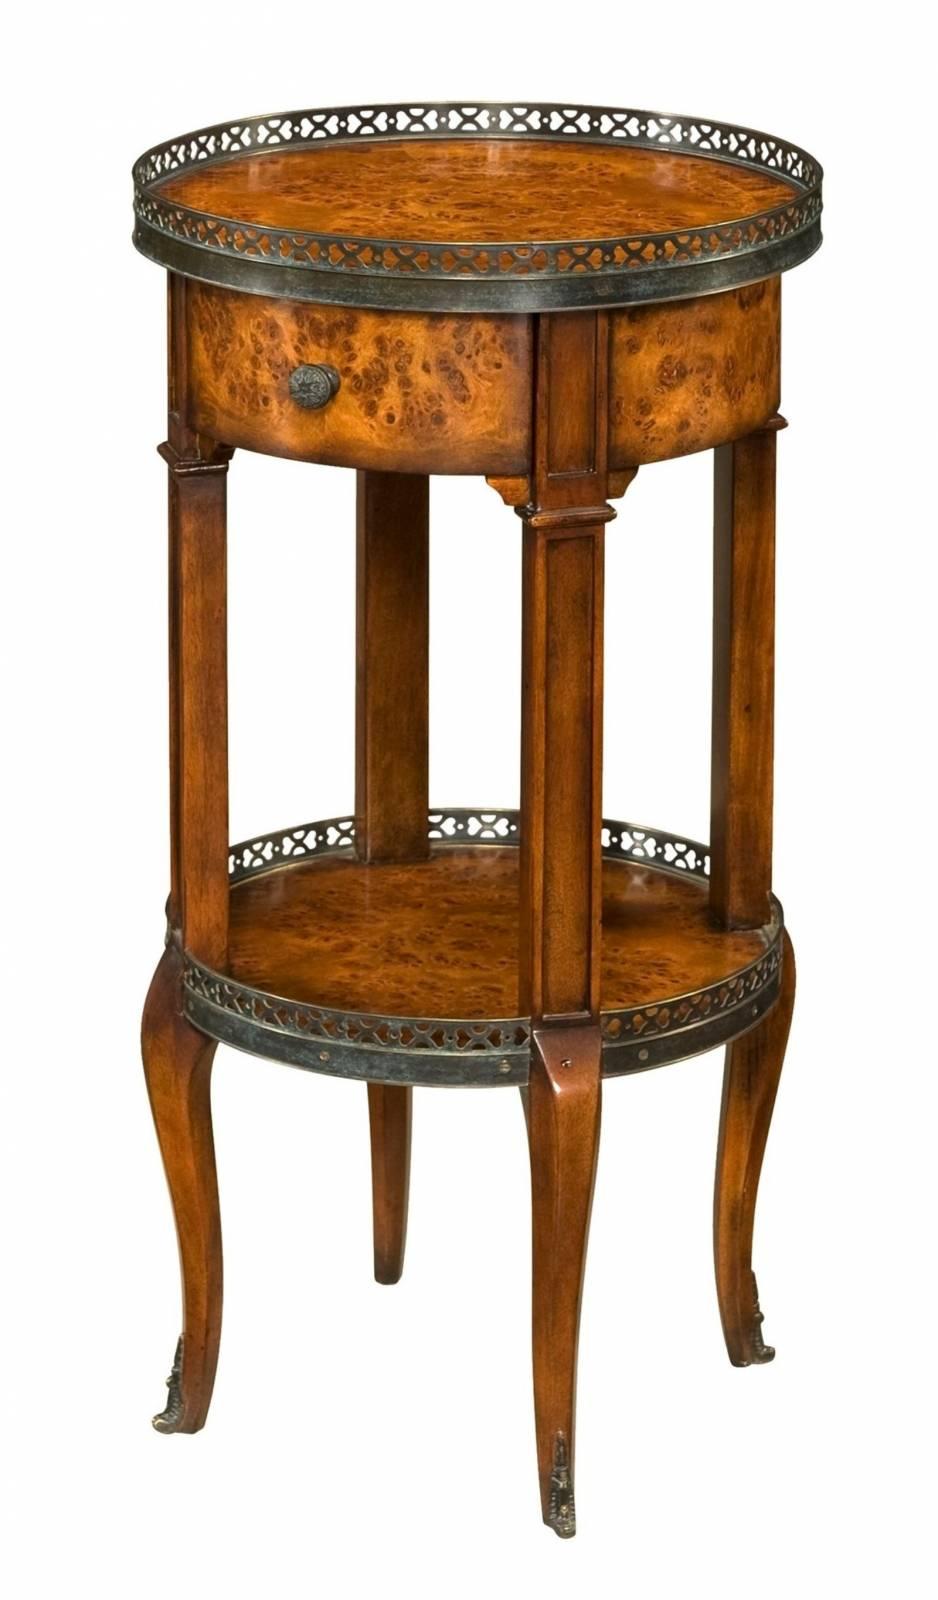 A circular poplar burl lamp table